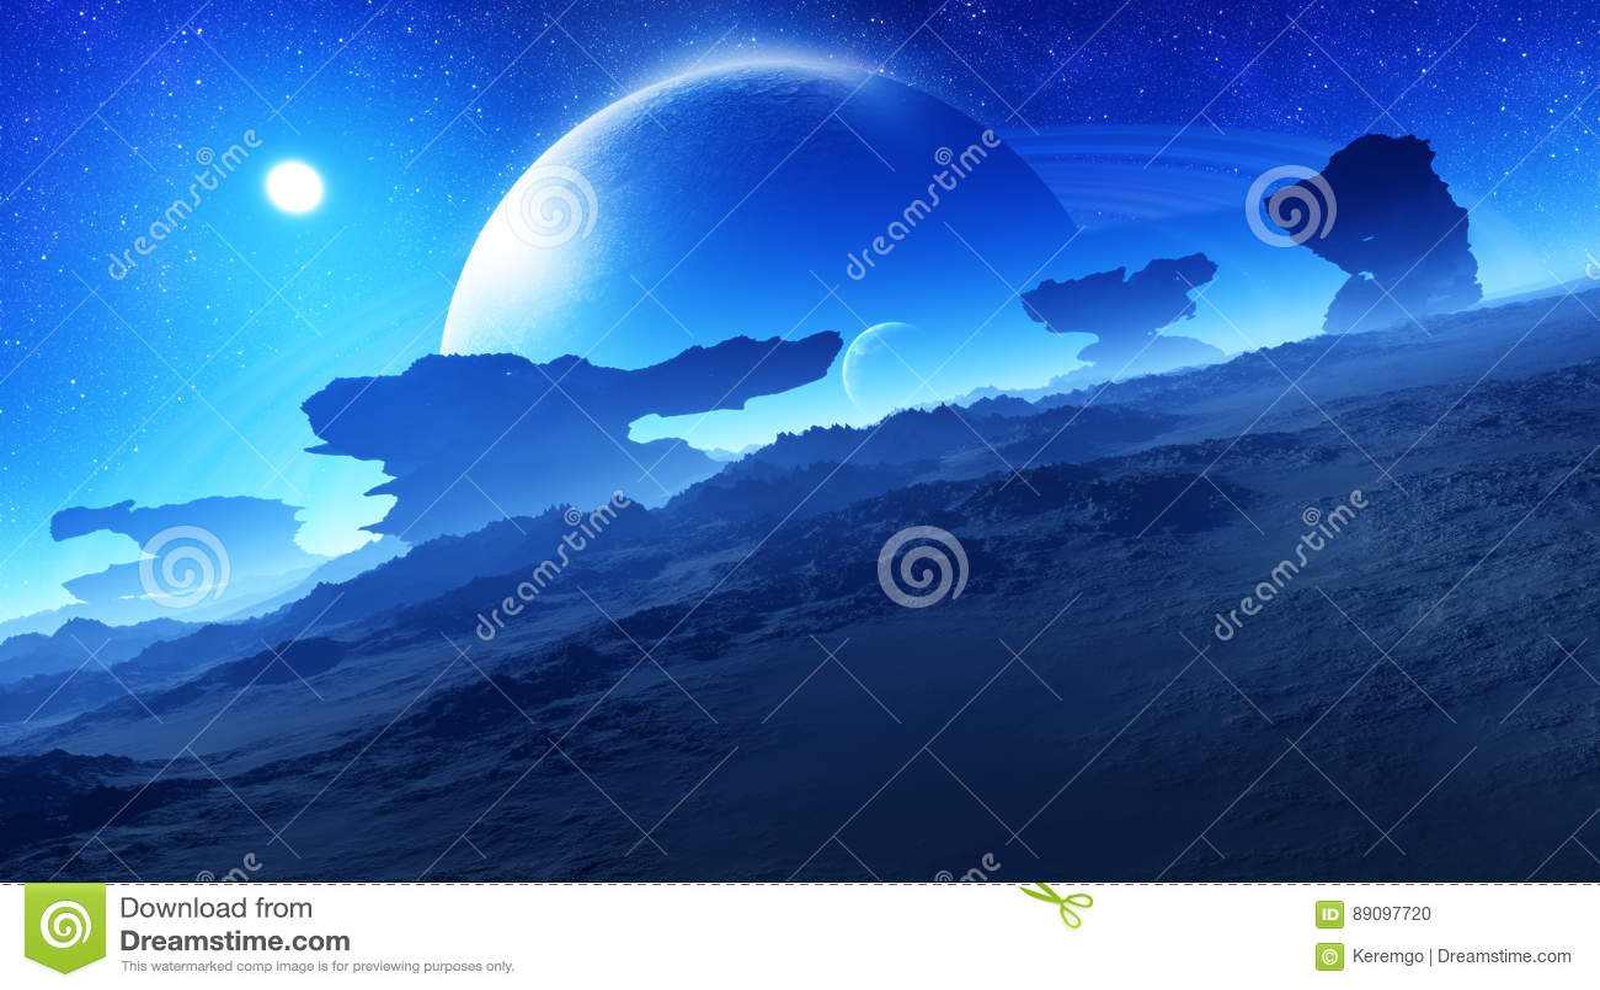 Epicka Chwalebnie Obca planety noc